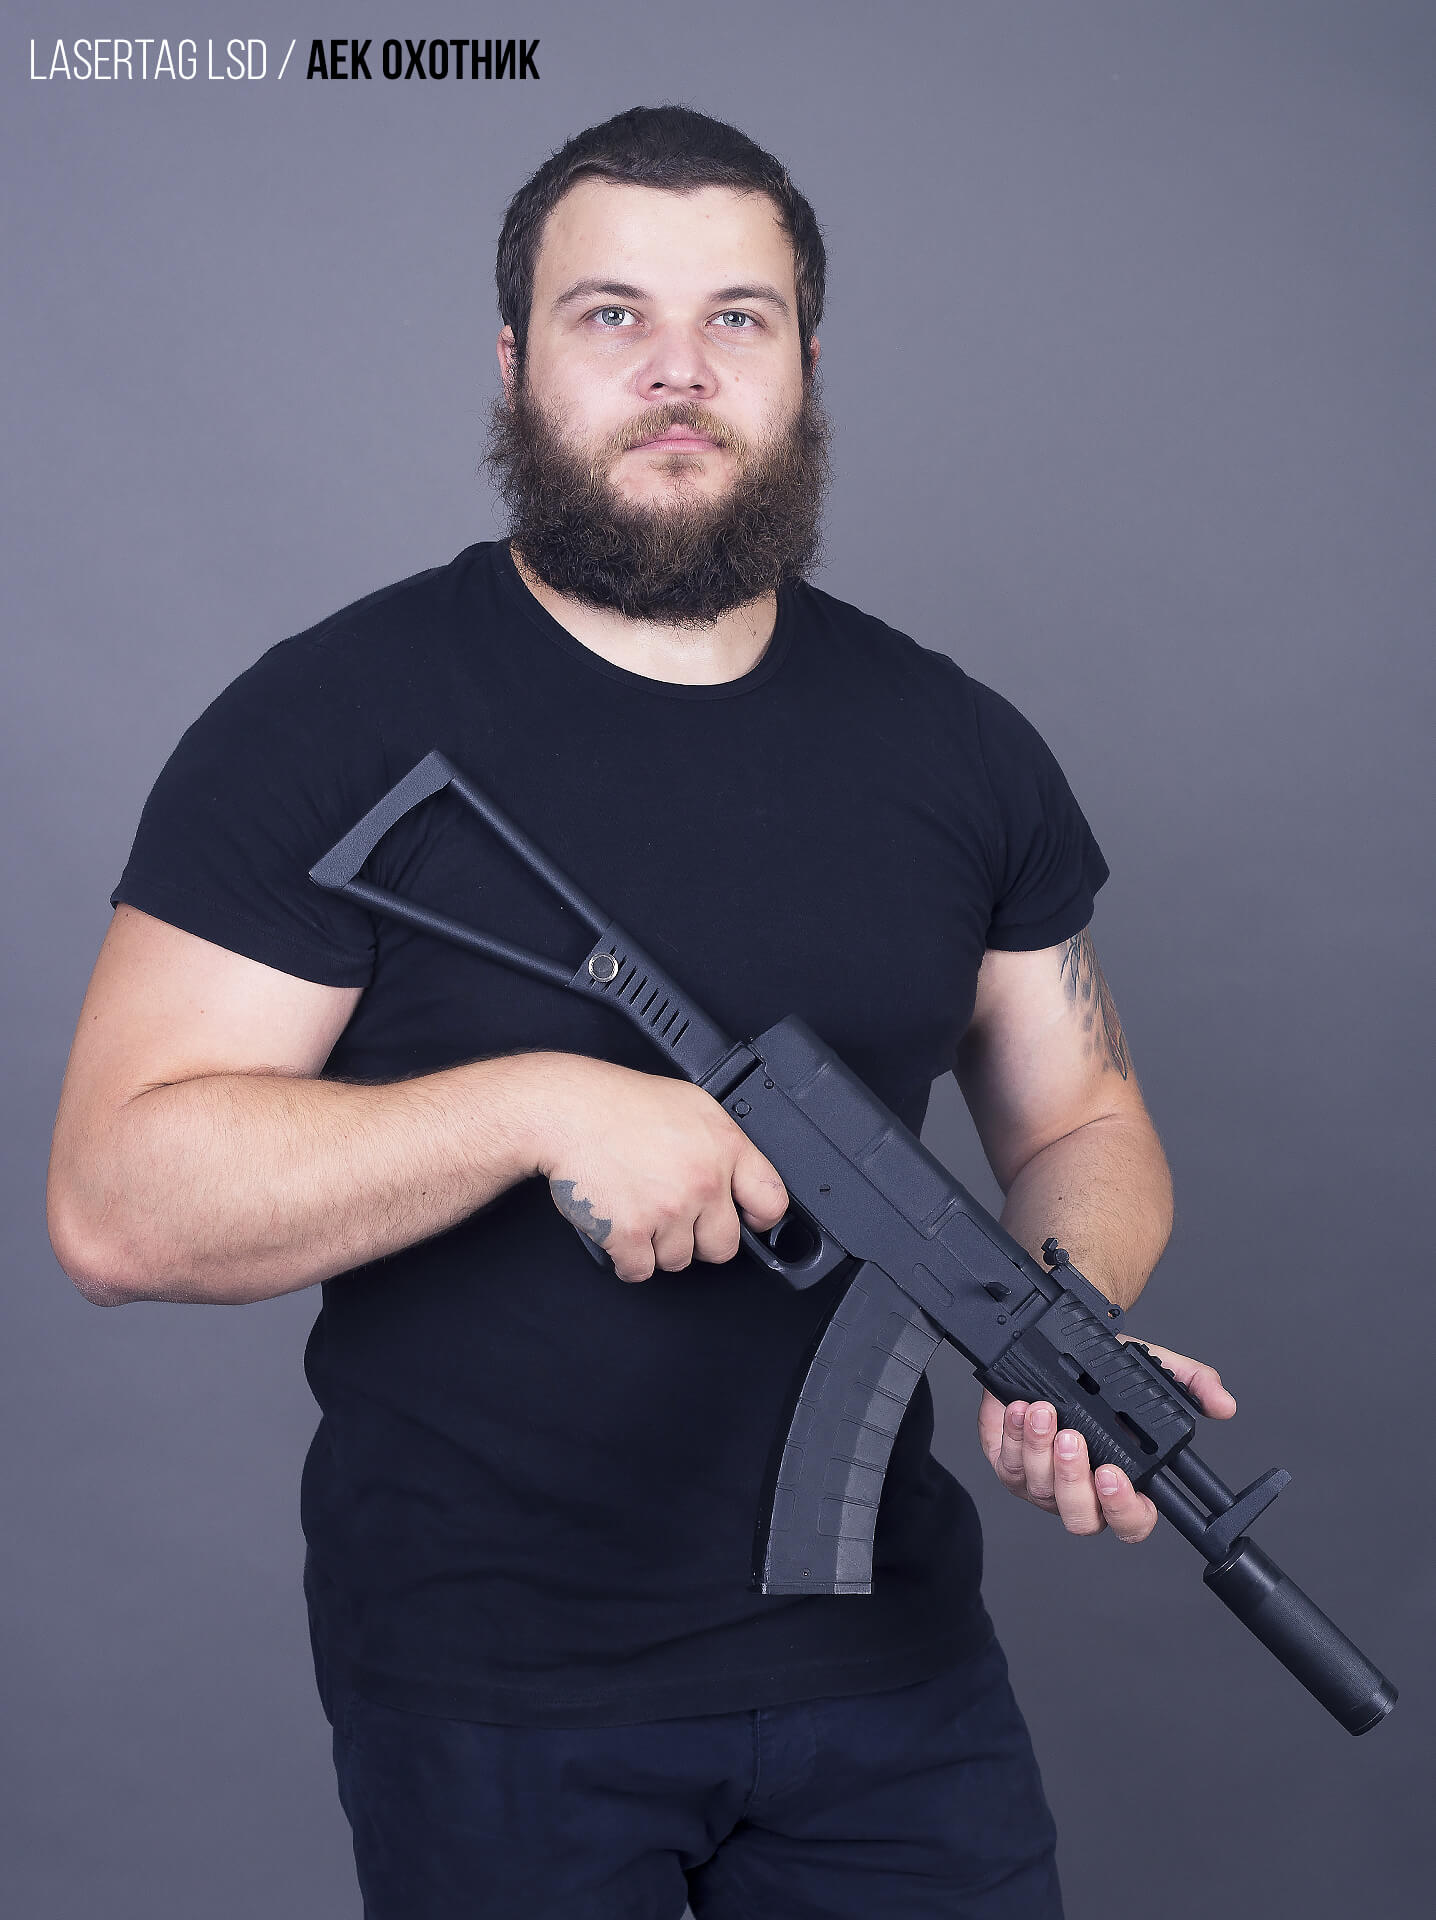 АЕК_ ОХОТНИК_5